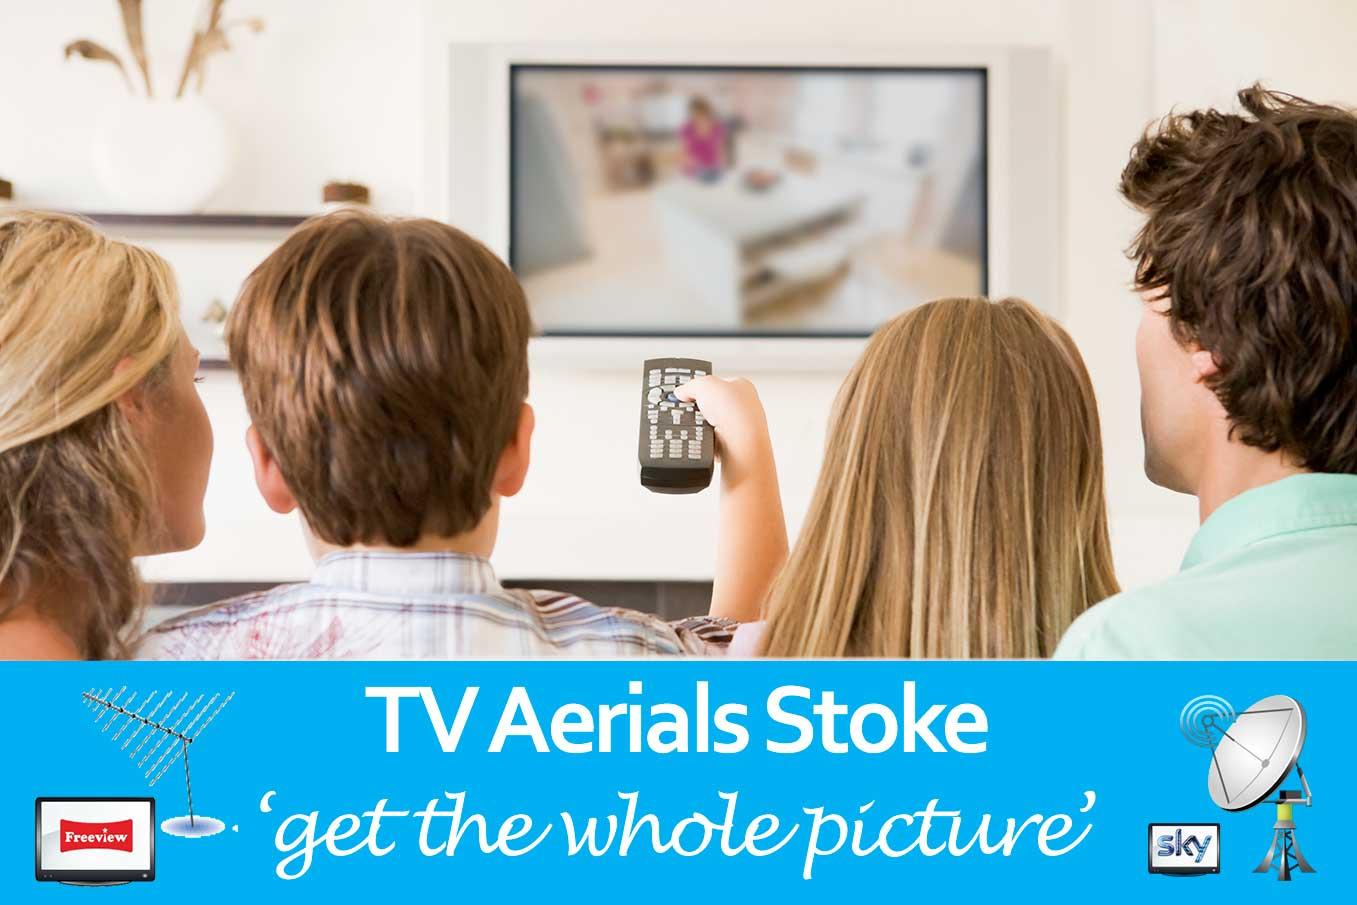 tv aerials stoke